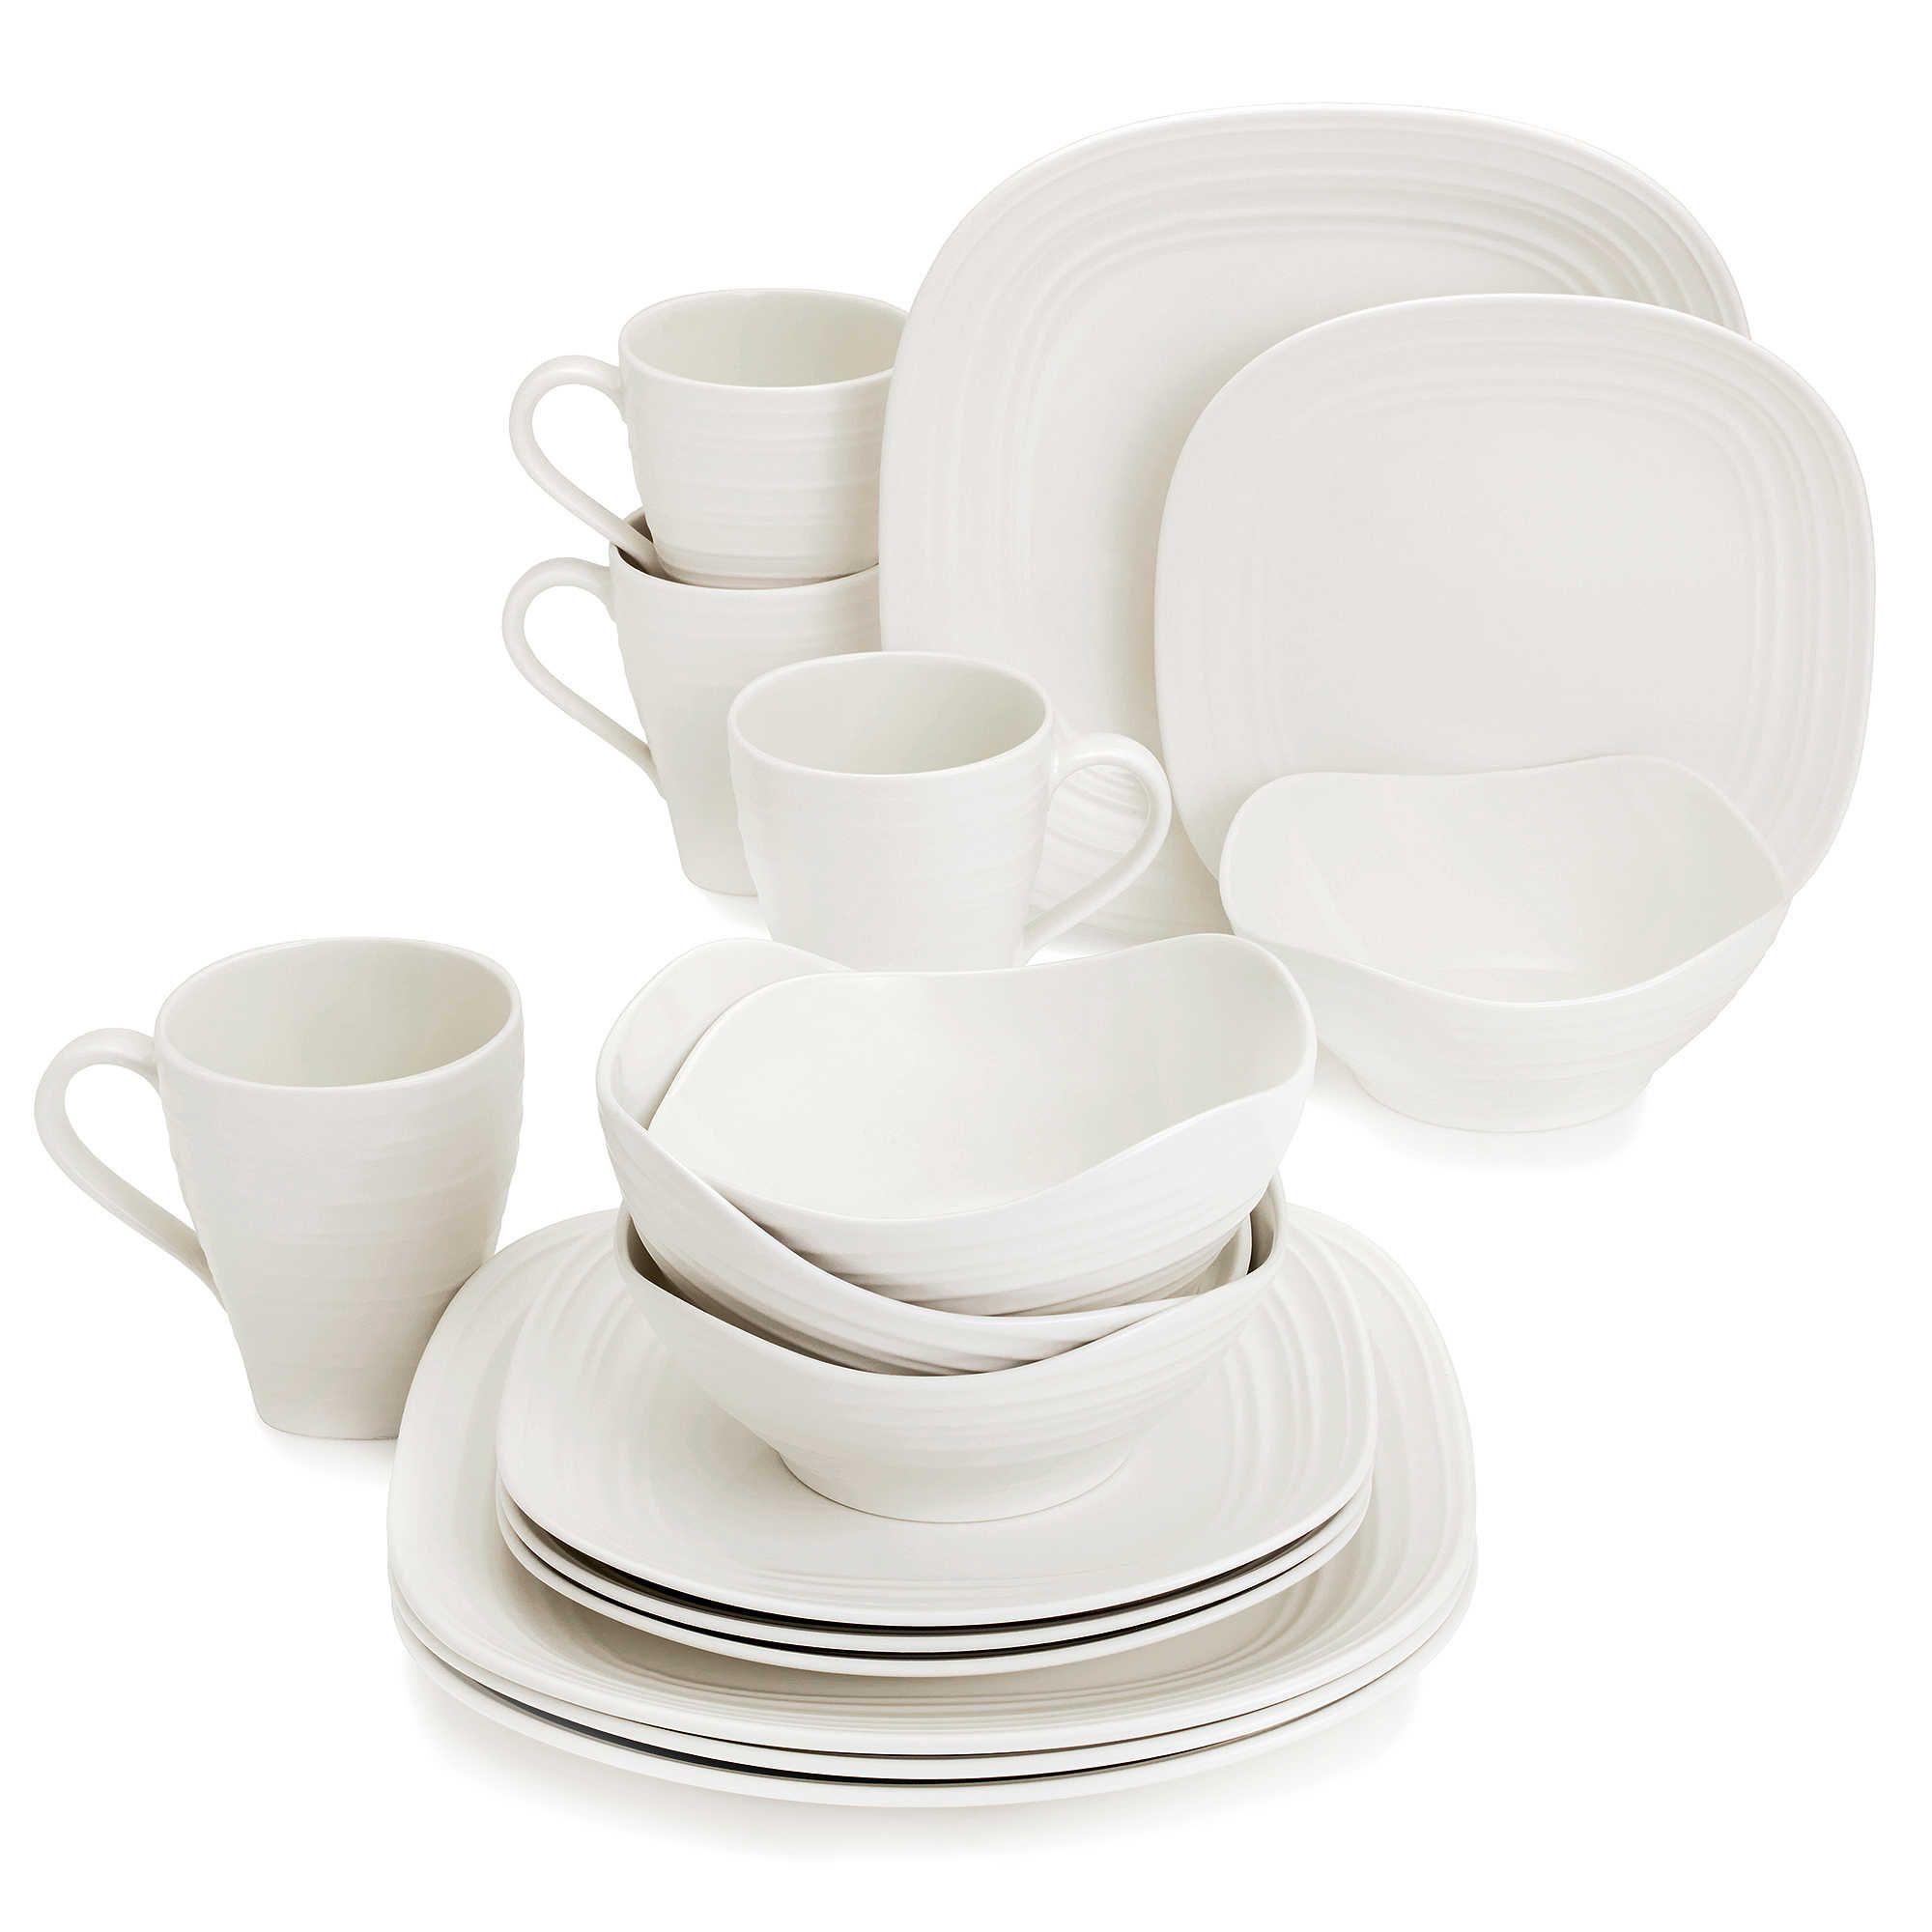 Mikasa® Swirl Square White 16-Piece Dinnerware Set  sc 1 st  Pinterest & Mikasa® Swirl Square White 16-Piece Dinnerware Set | Accessories ...